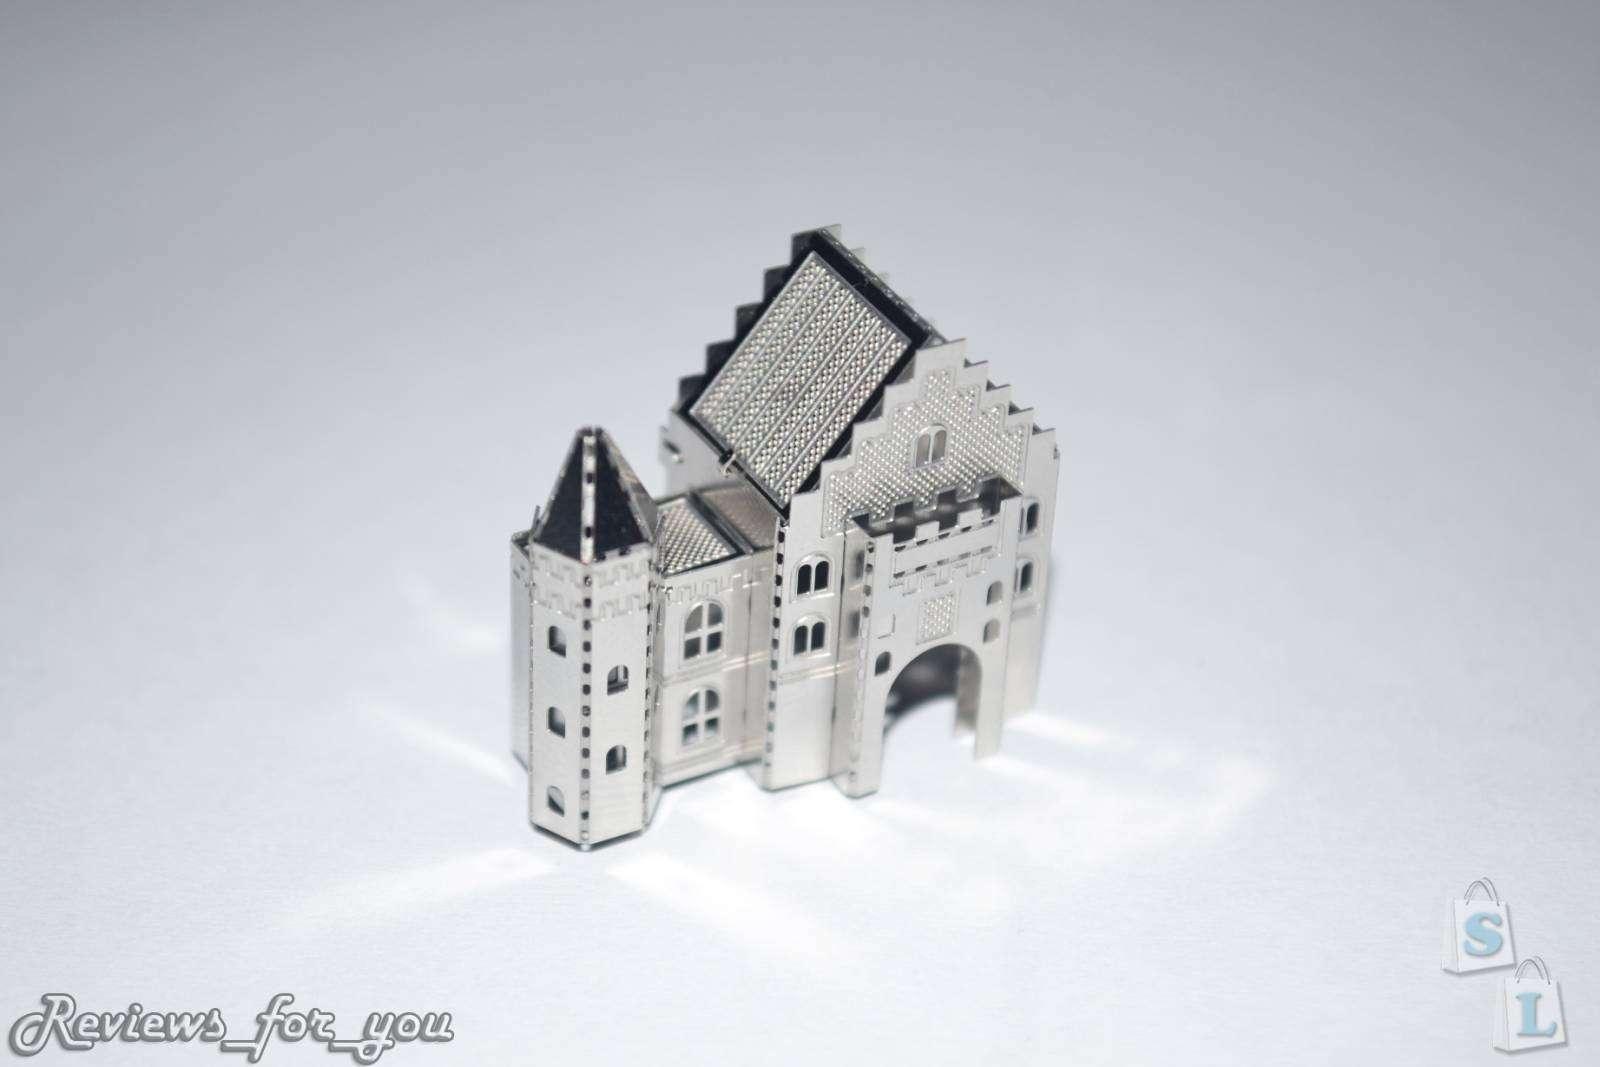 ChinaBuye: Металлический 3D пазл, маленькая модель 'Замка Нойшванштайн', Neuschwanstein Castle 3D Puzzle